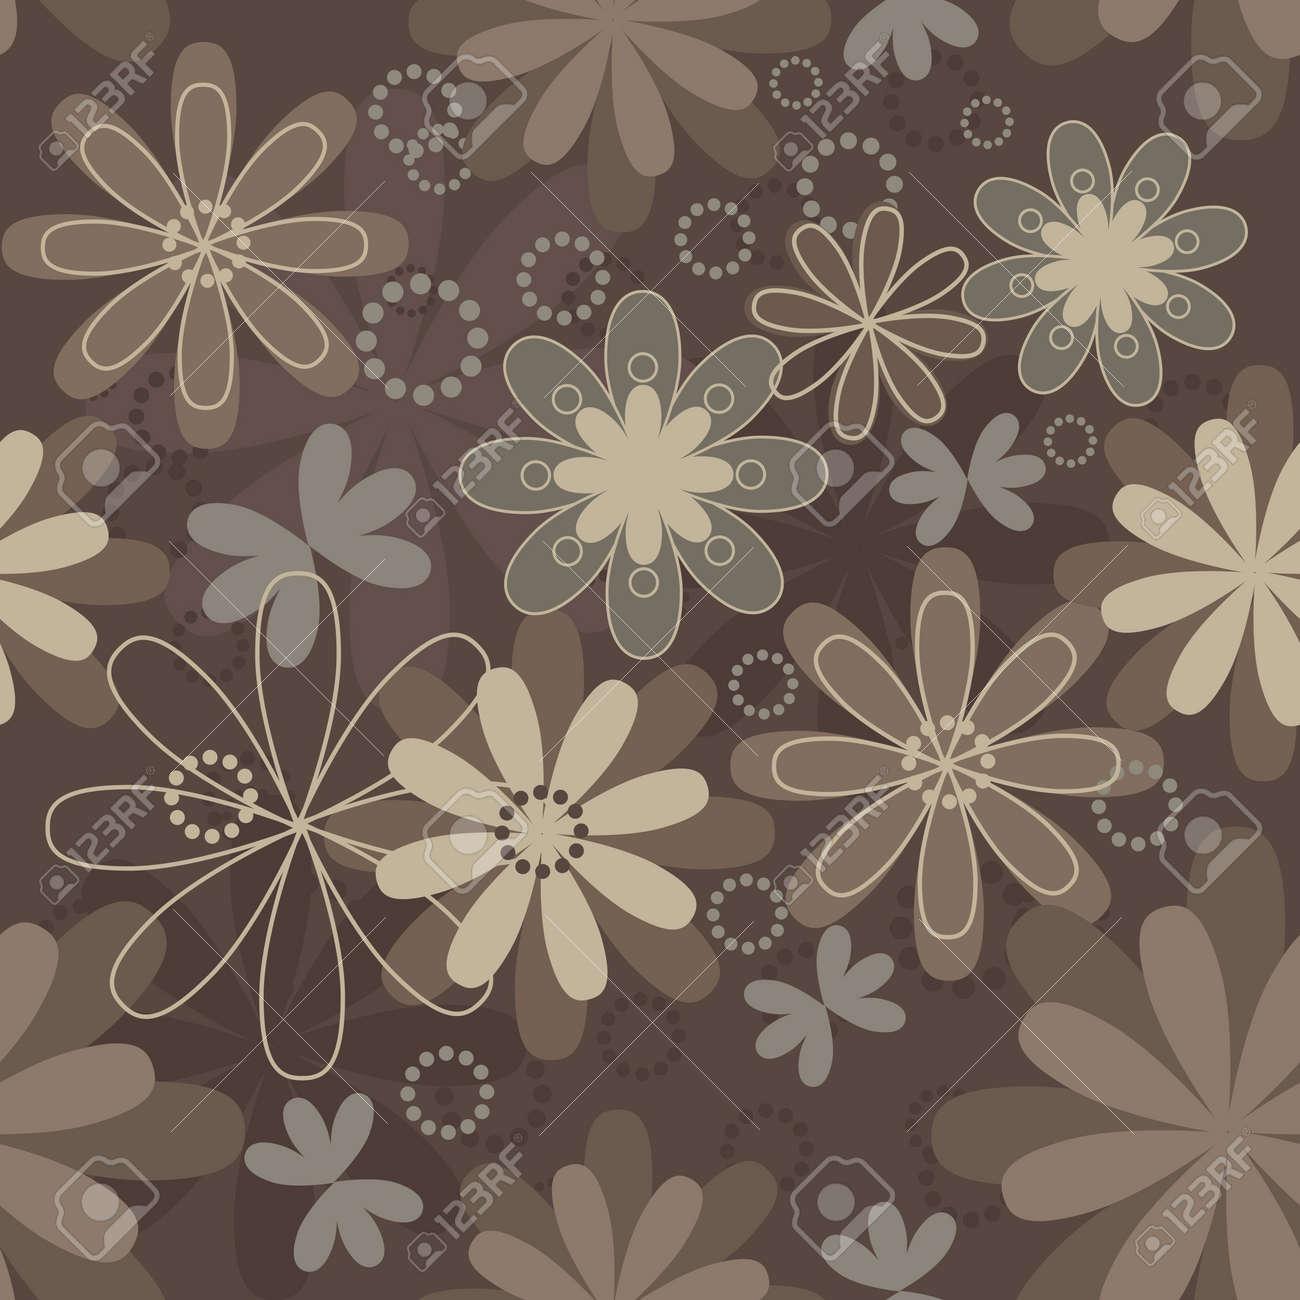 Vintage Art Vector Flower Seamless Pattern Background Fabric Texture Floral Design Pretty Cute